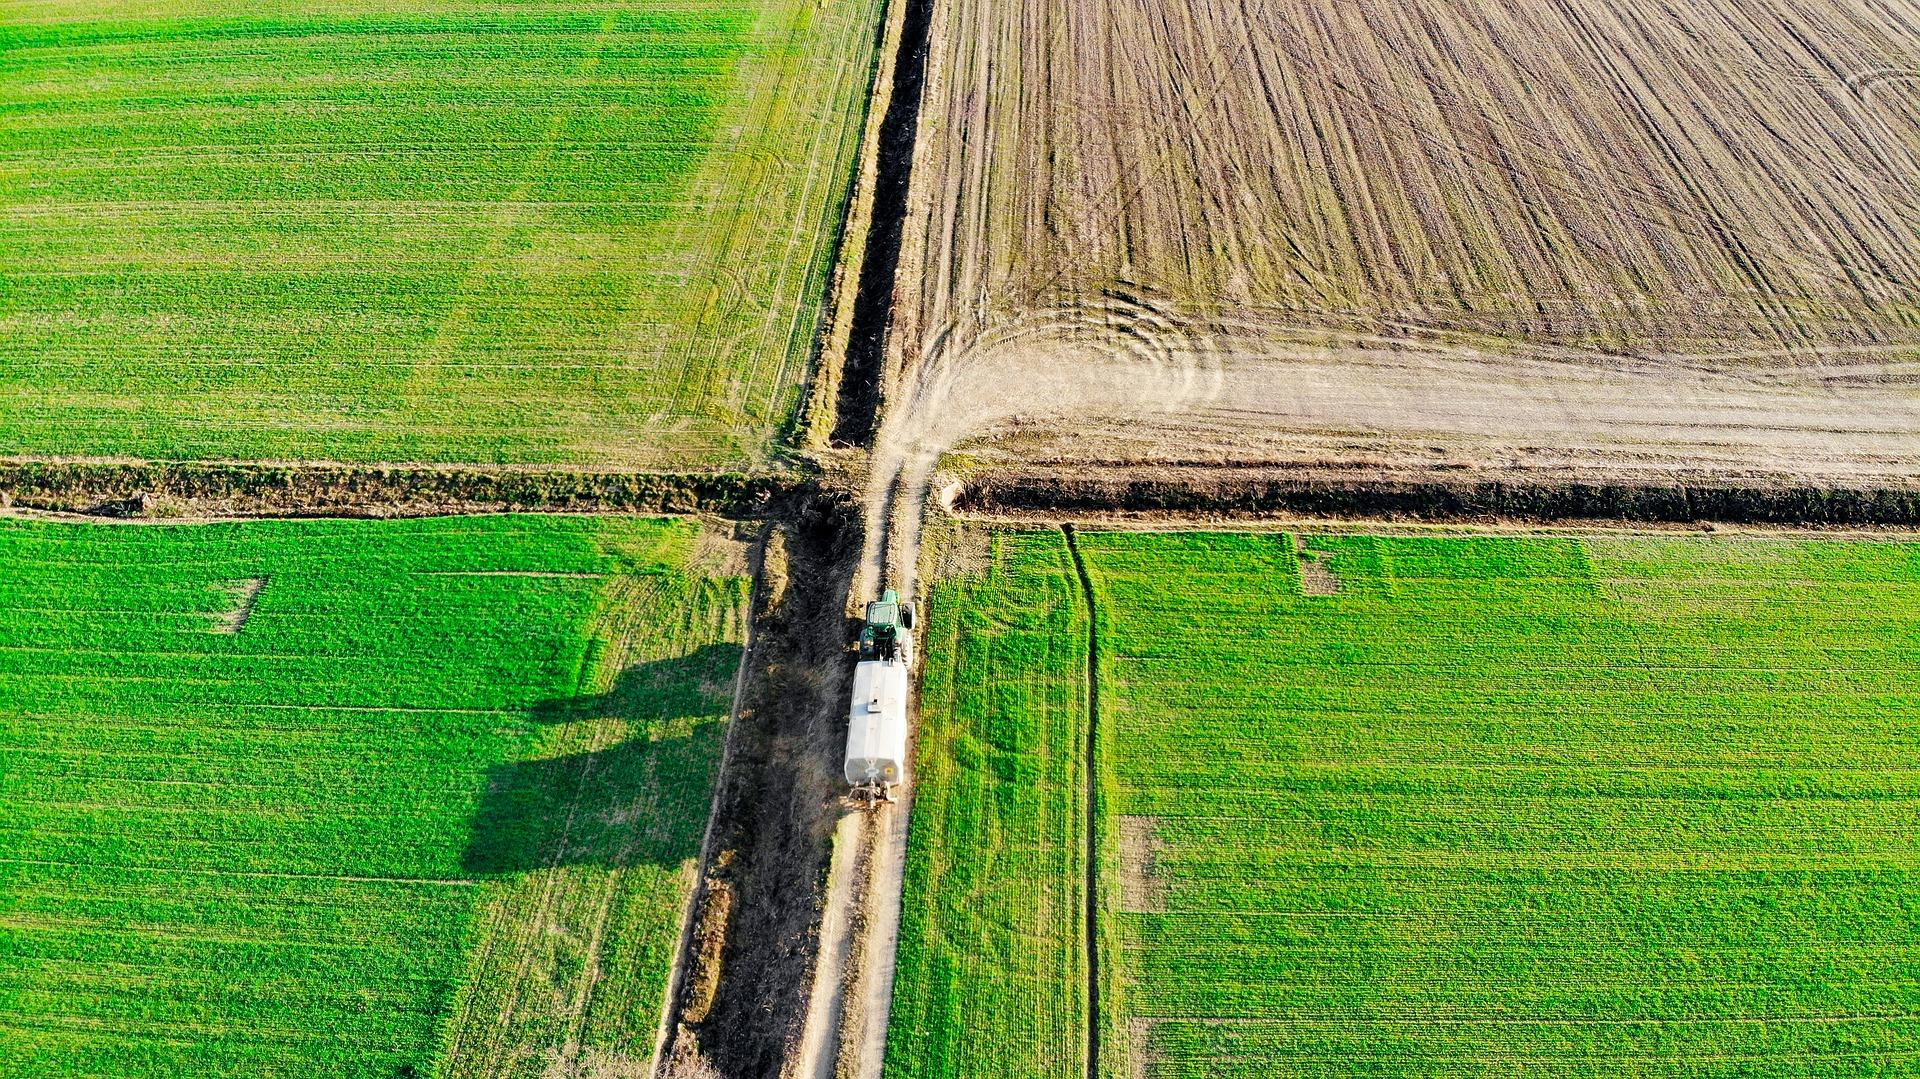 Mali posedi možda ipak nisu prepreka za razvoj poljoprivrede